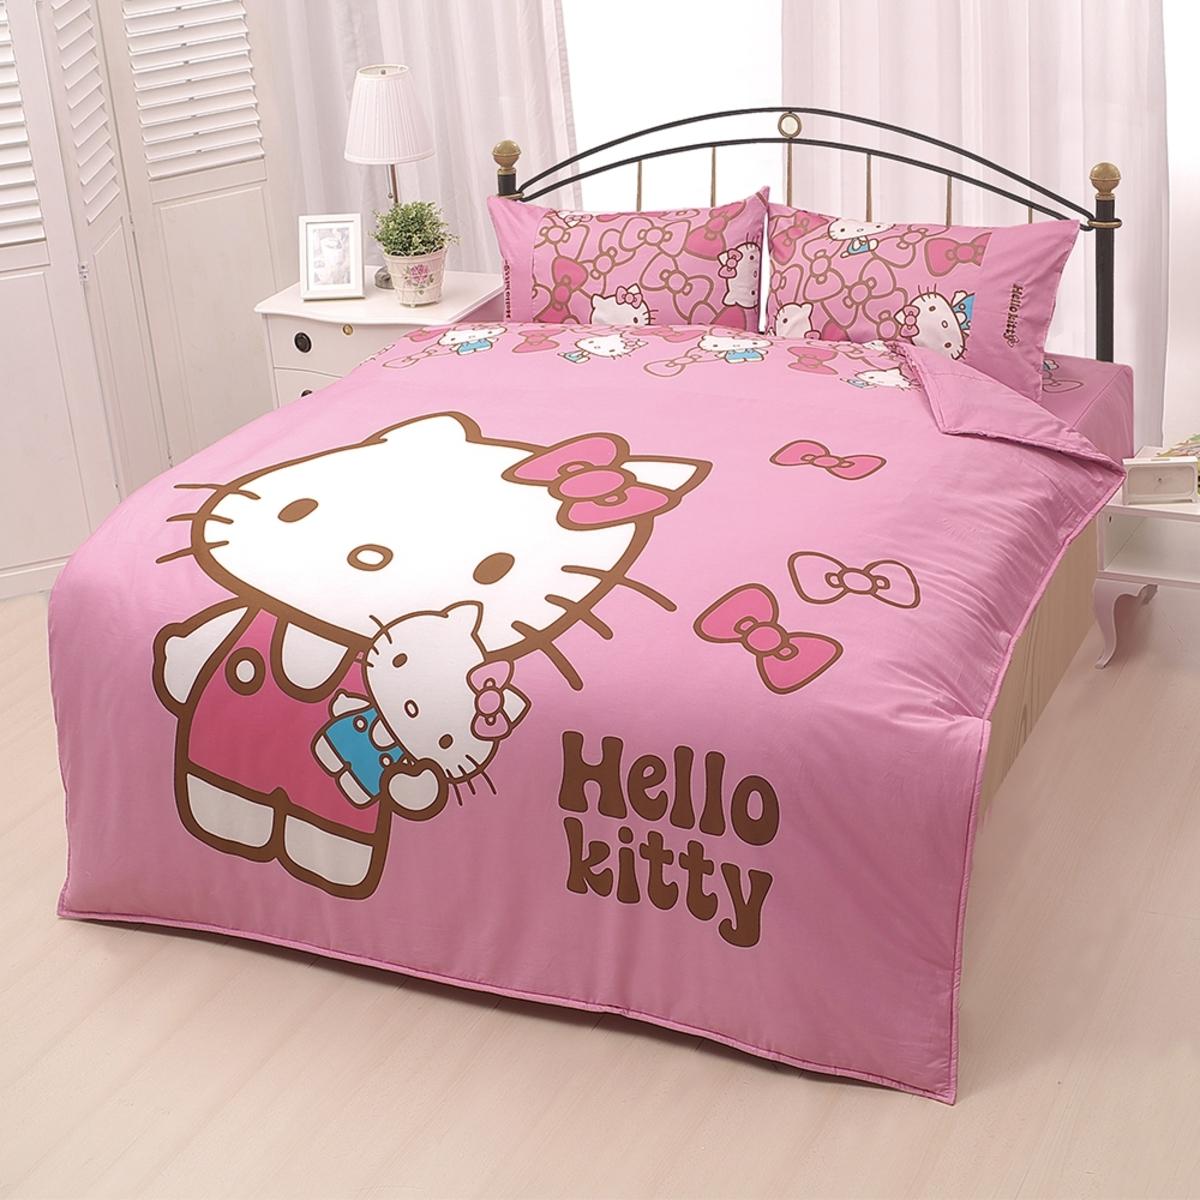 Hello Kitty 我的娃娃 雙人兩用被床包4件組